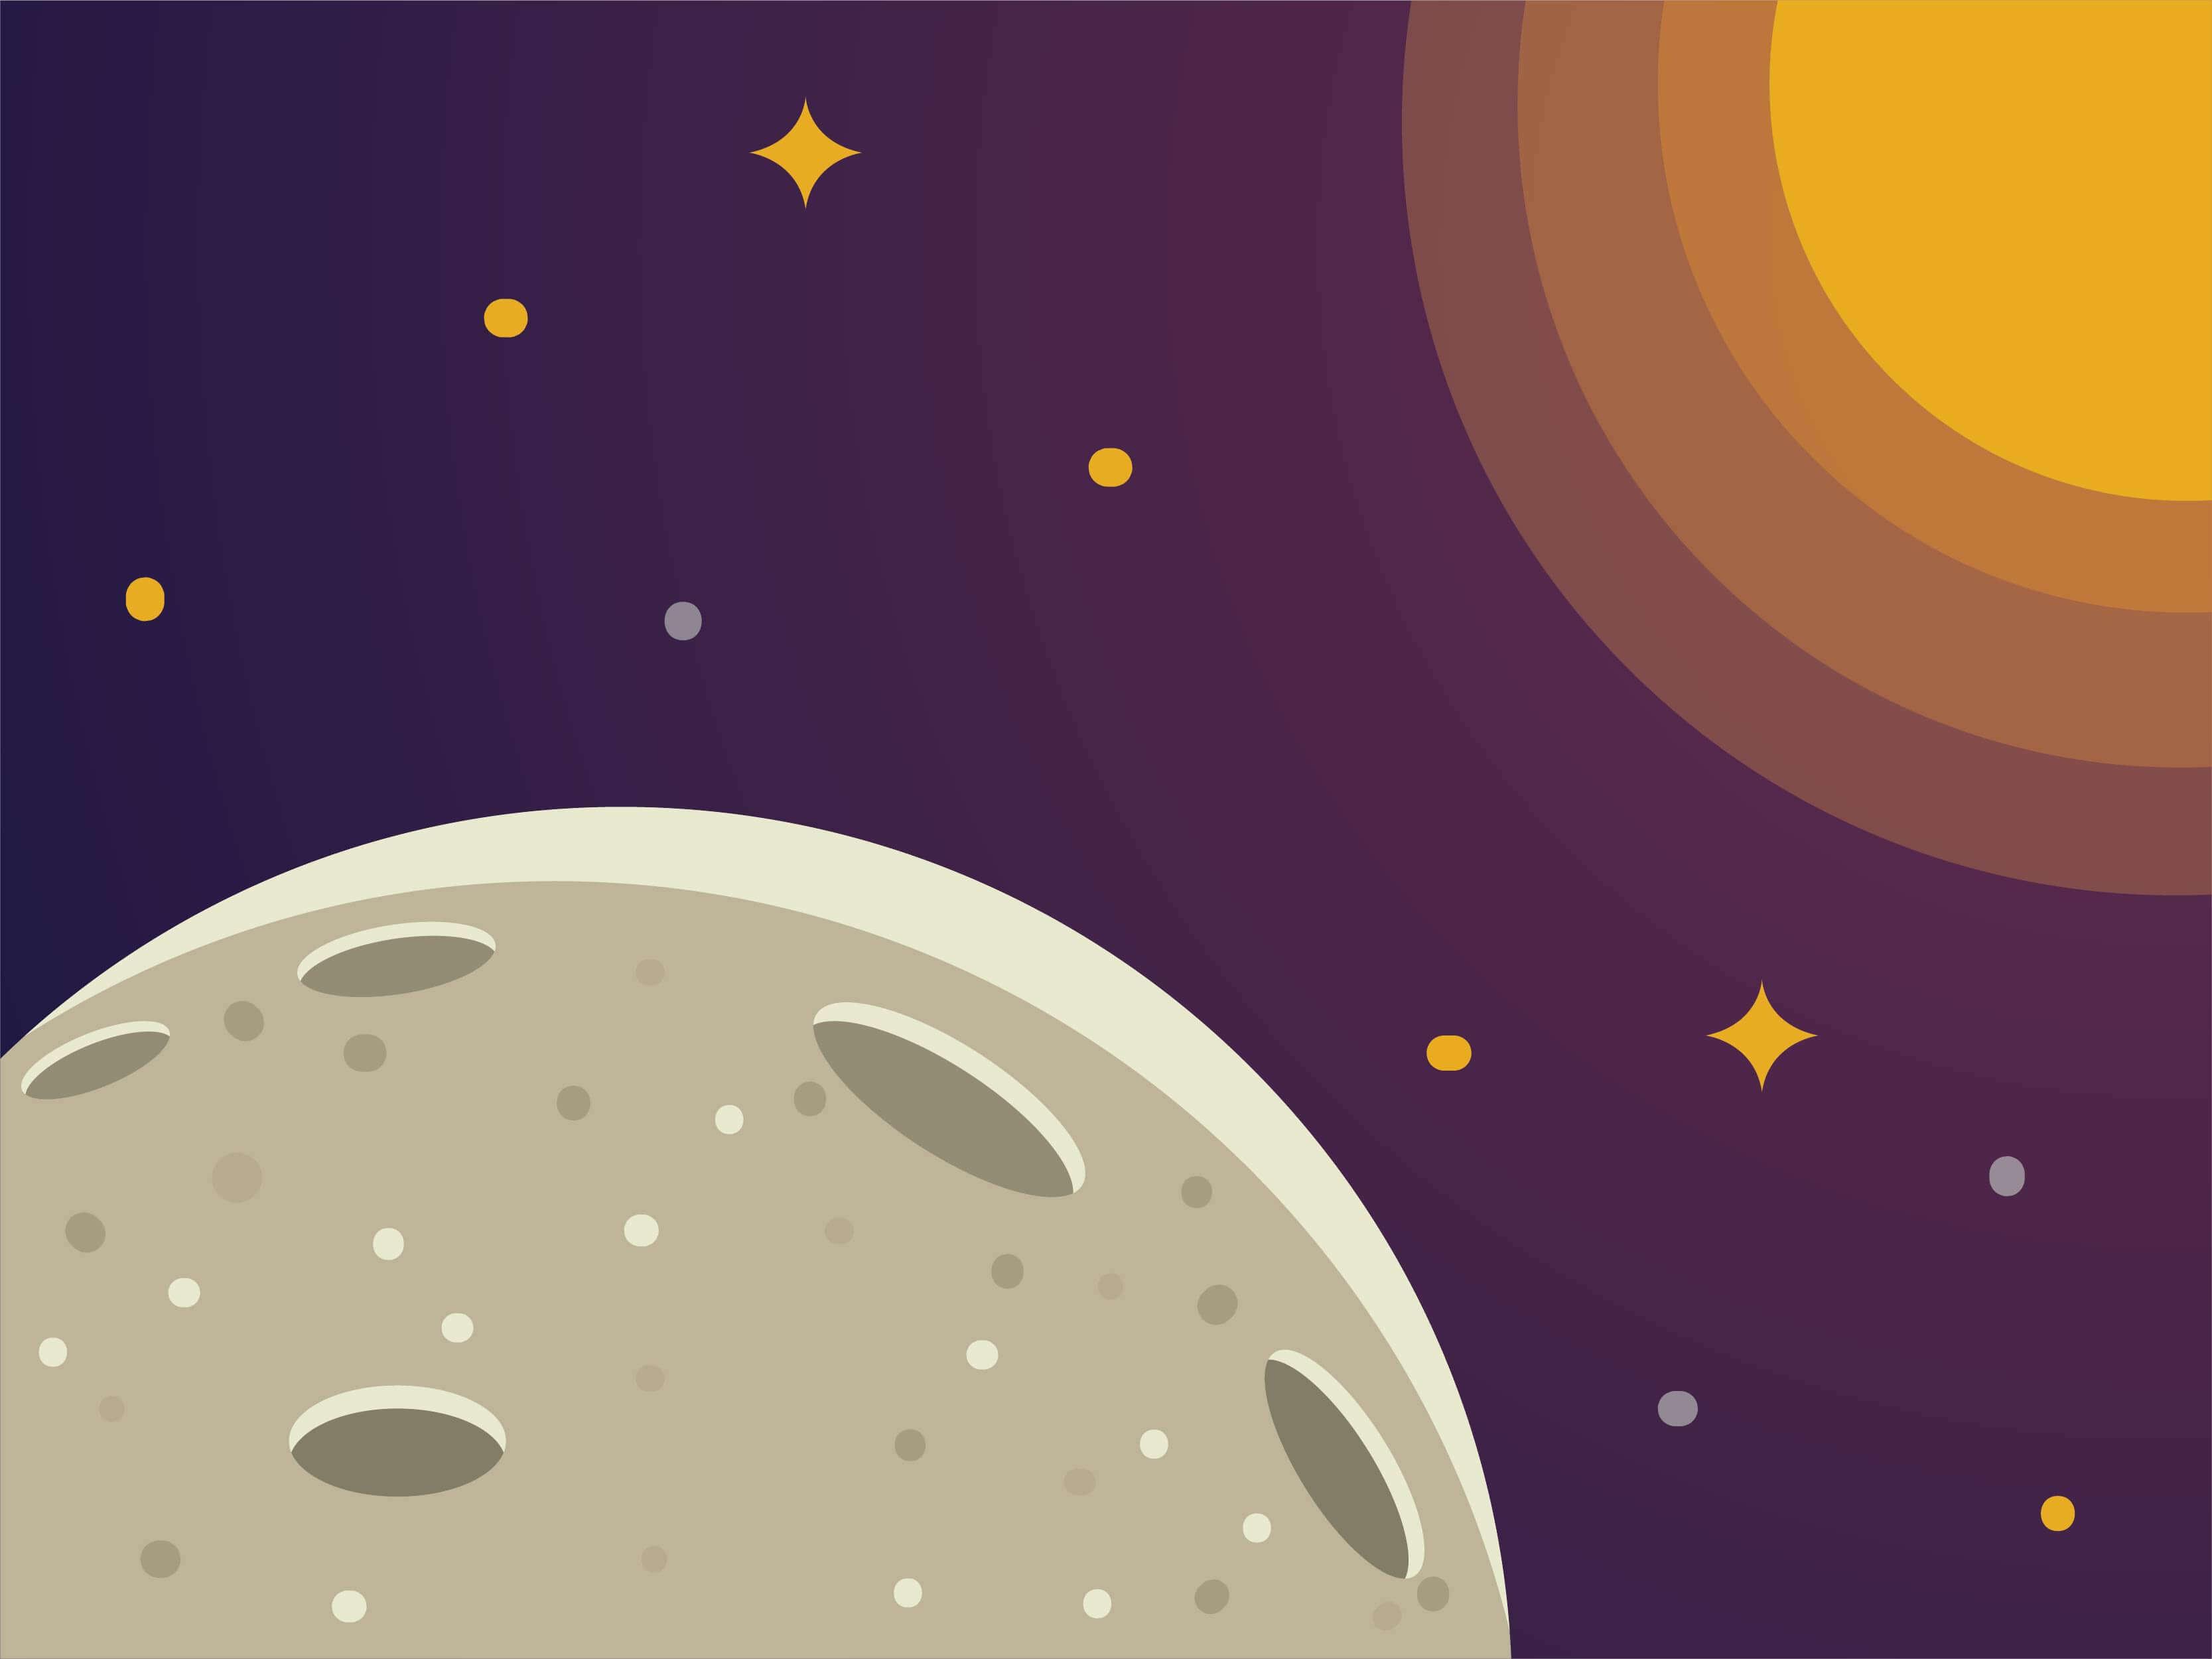 Moon Spacescape Illustration Download Free Vector Art